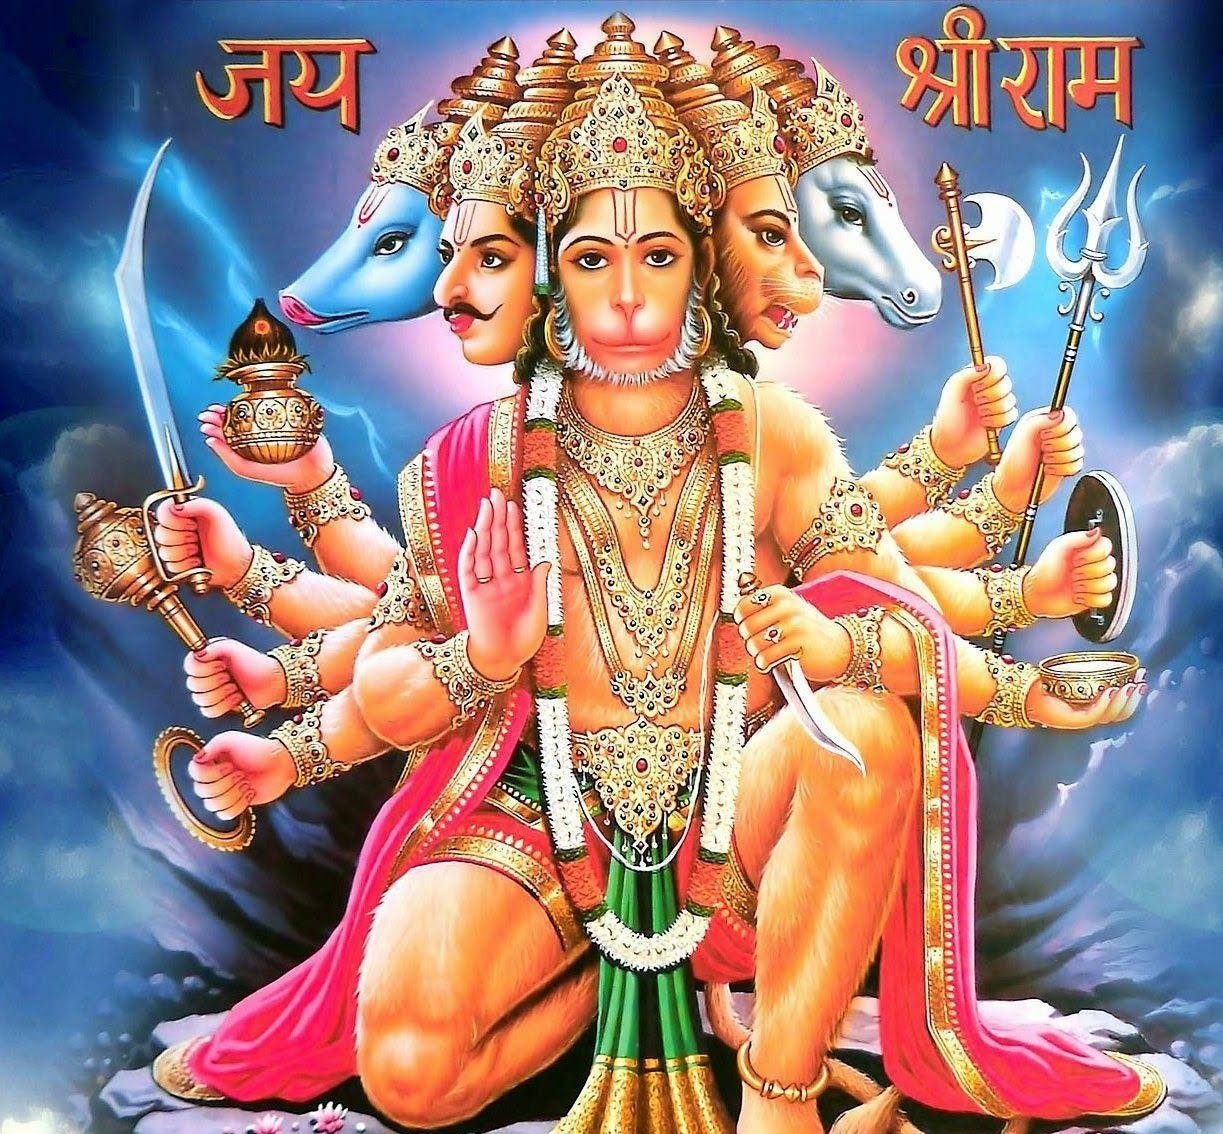 Hd wallpaper jai shri ram - Happy Dussehra Hd Wallpapers Of Lord Ram Images Pictures Medium 1600 1000 Ram